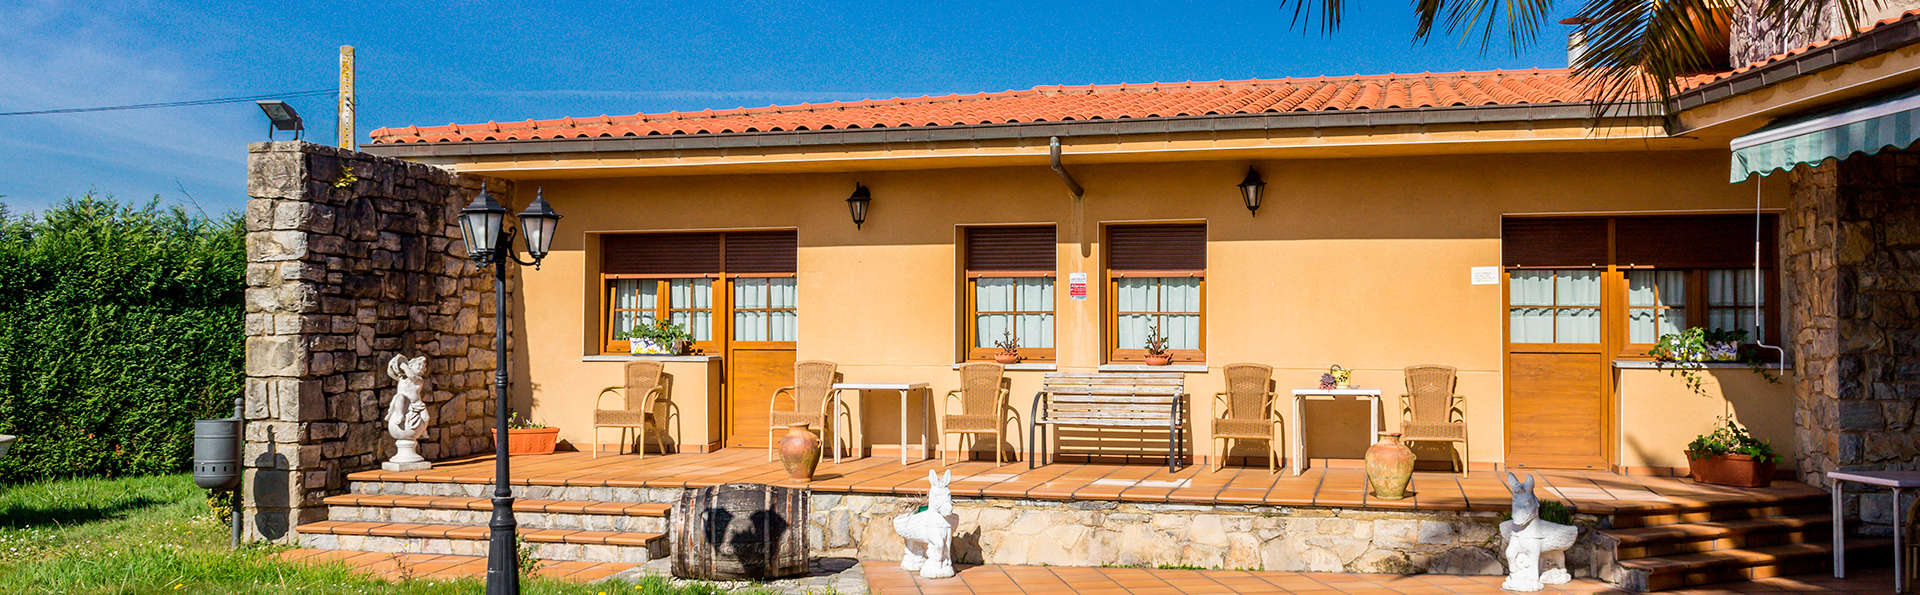 Hotel Villa San Remo - EDIT_front.jpg